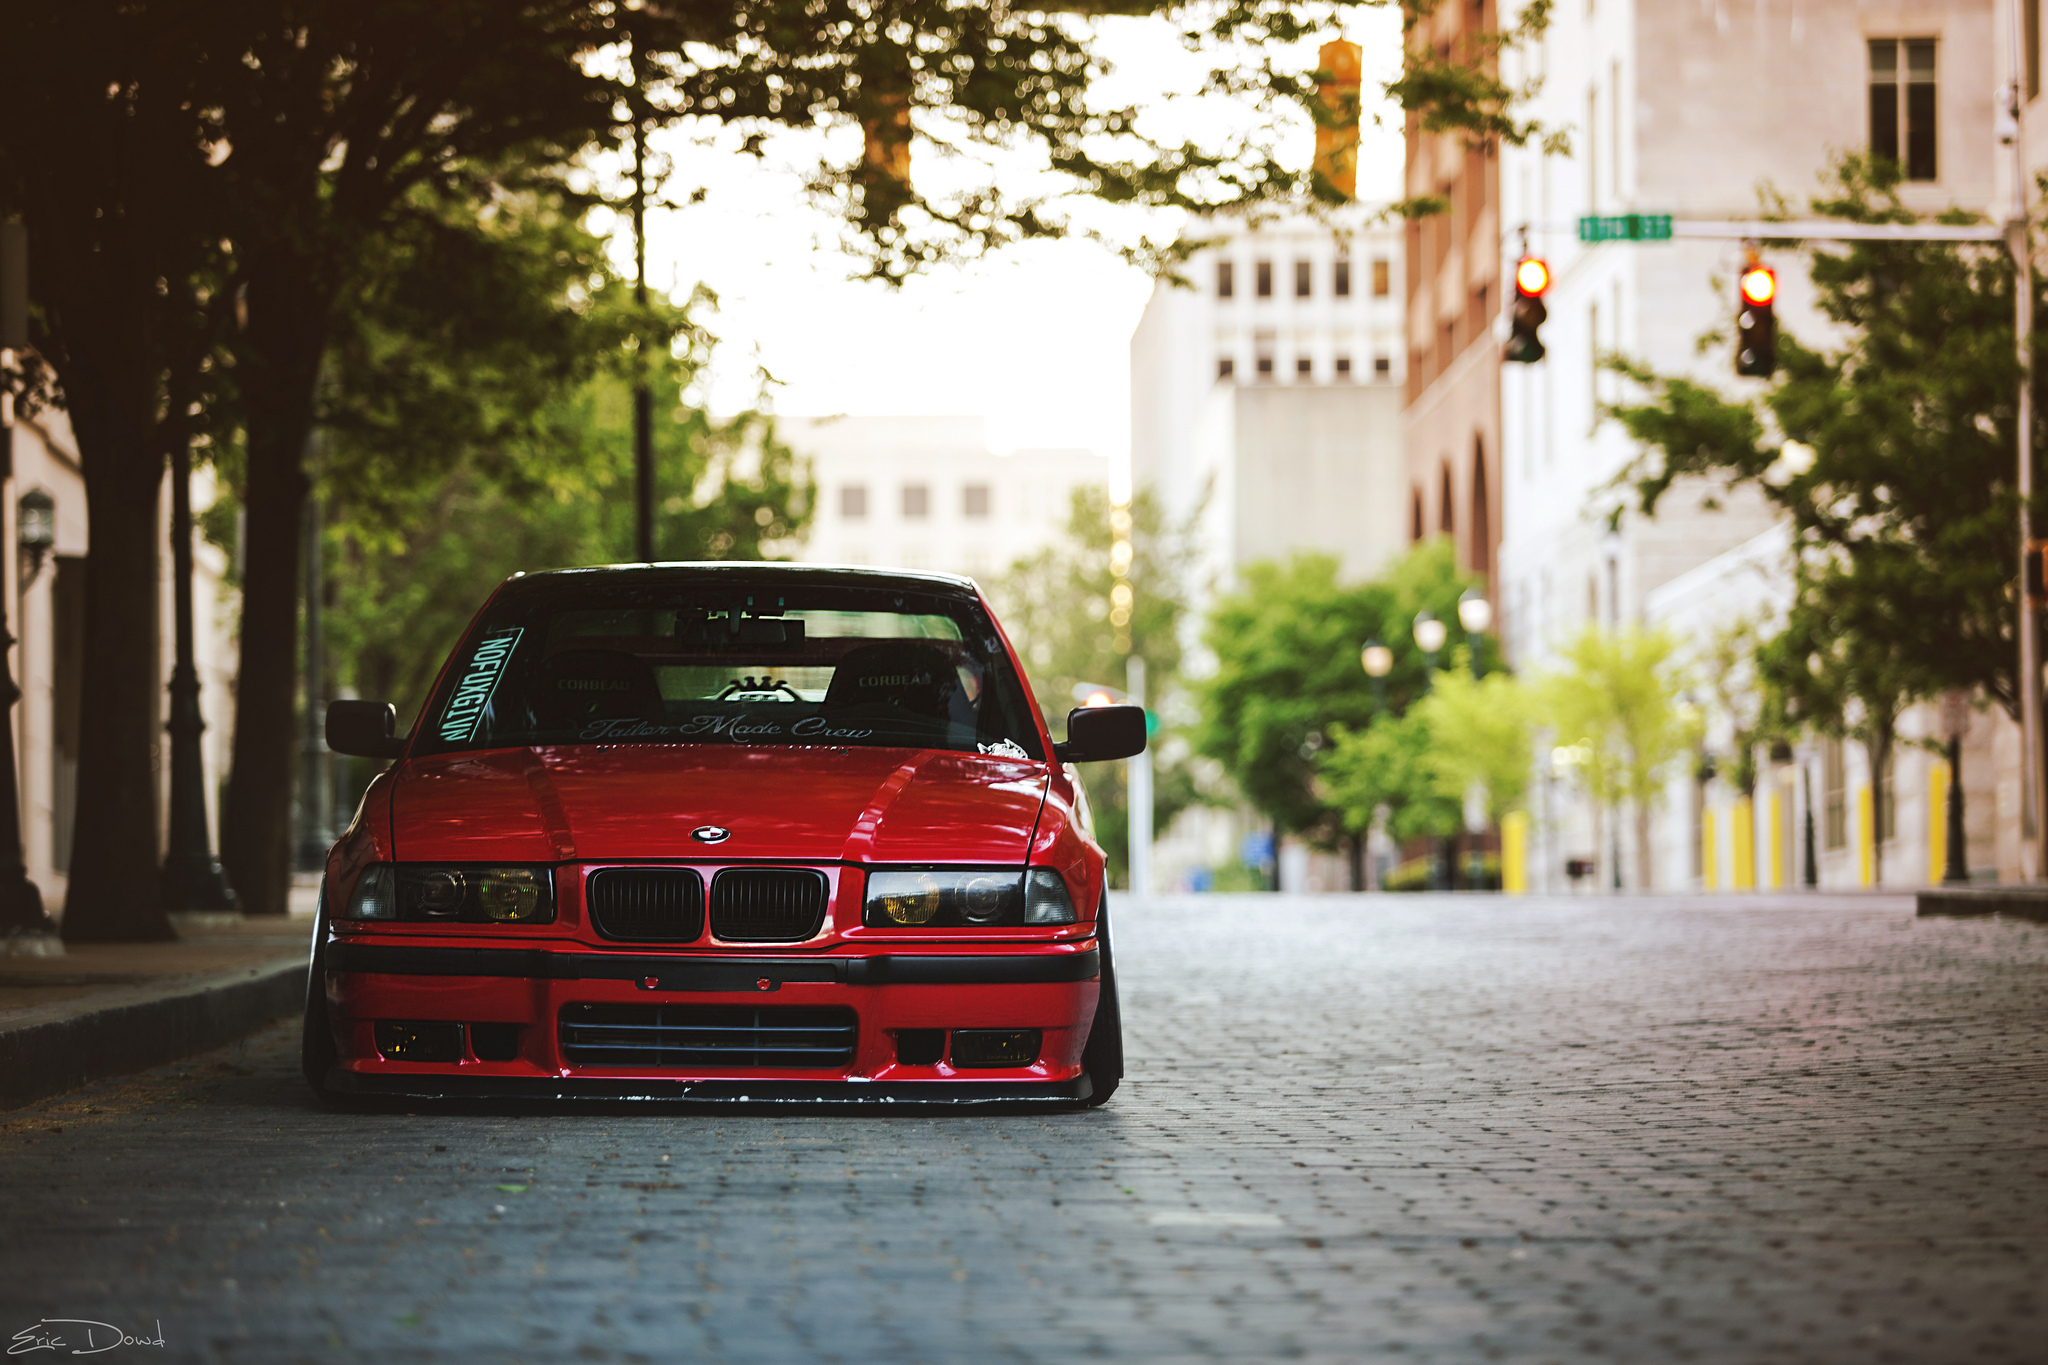 Desktop Wallpapers BMW E36 Red Street Cars 2048x1365 auto automobile